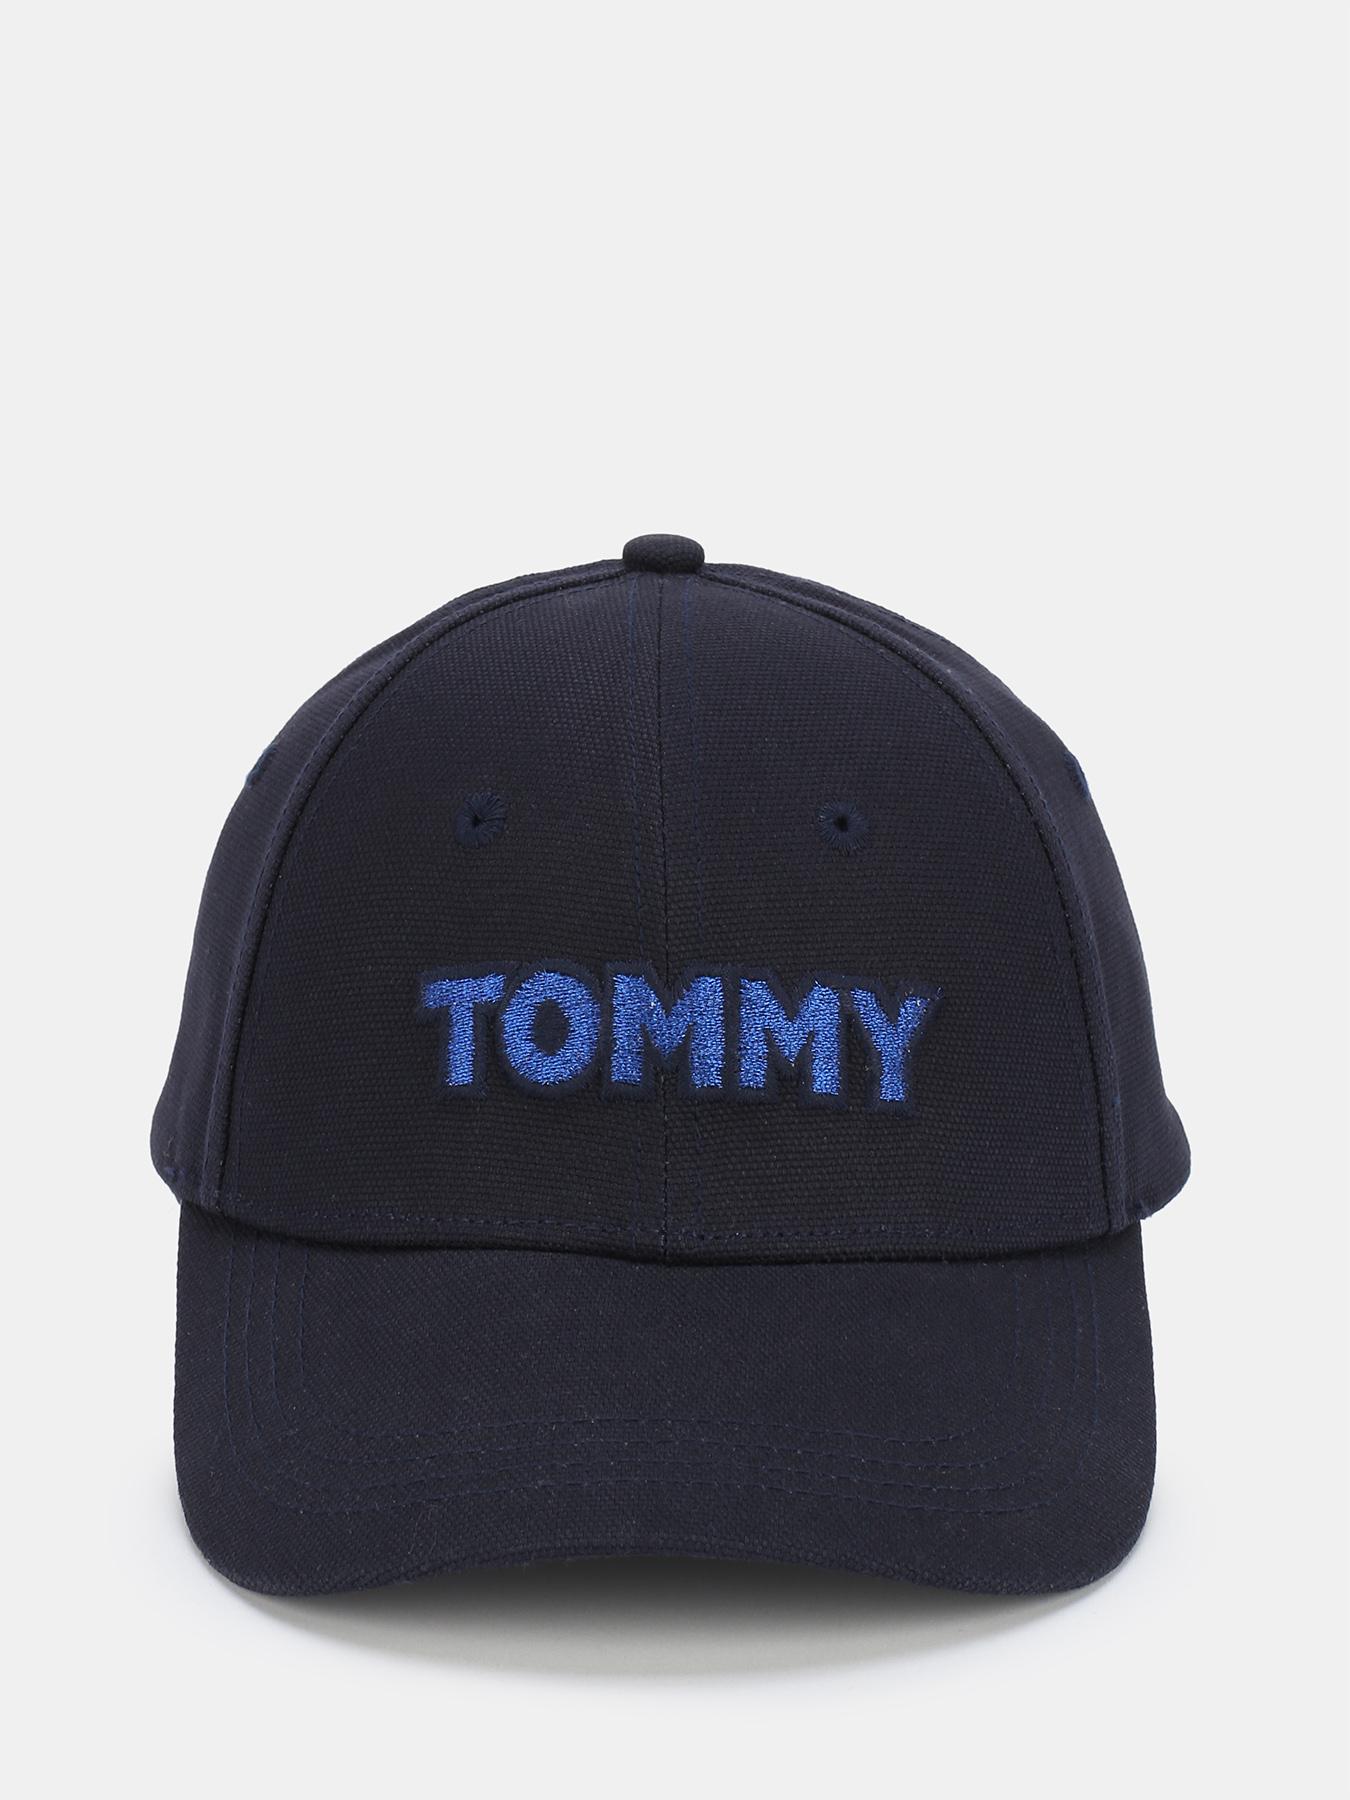 Бейсболка Tommy Hilfiger Бейсболка